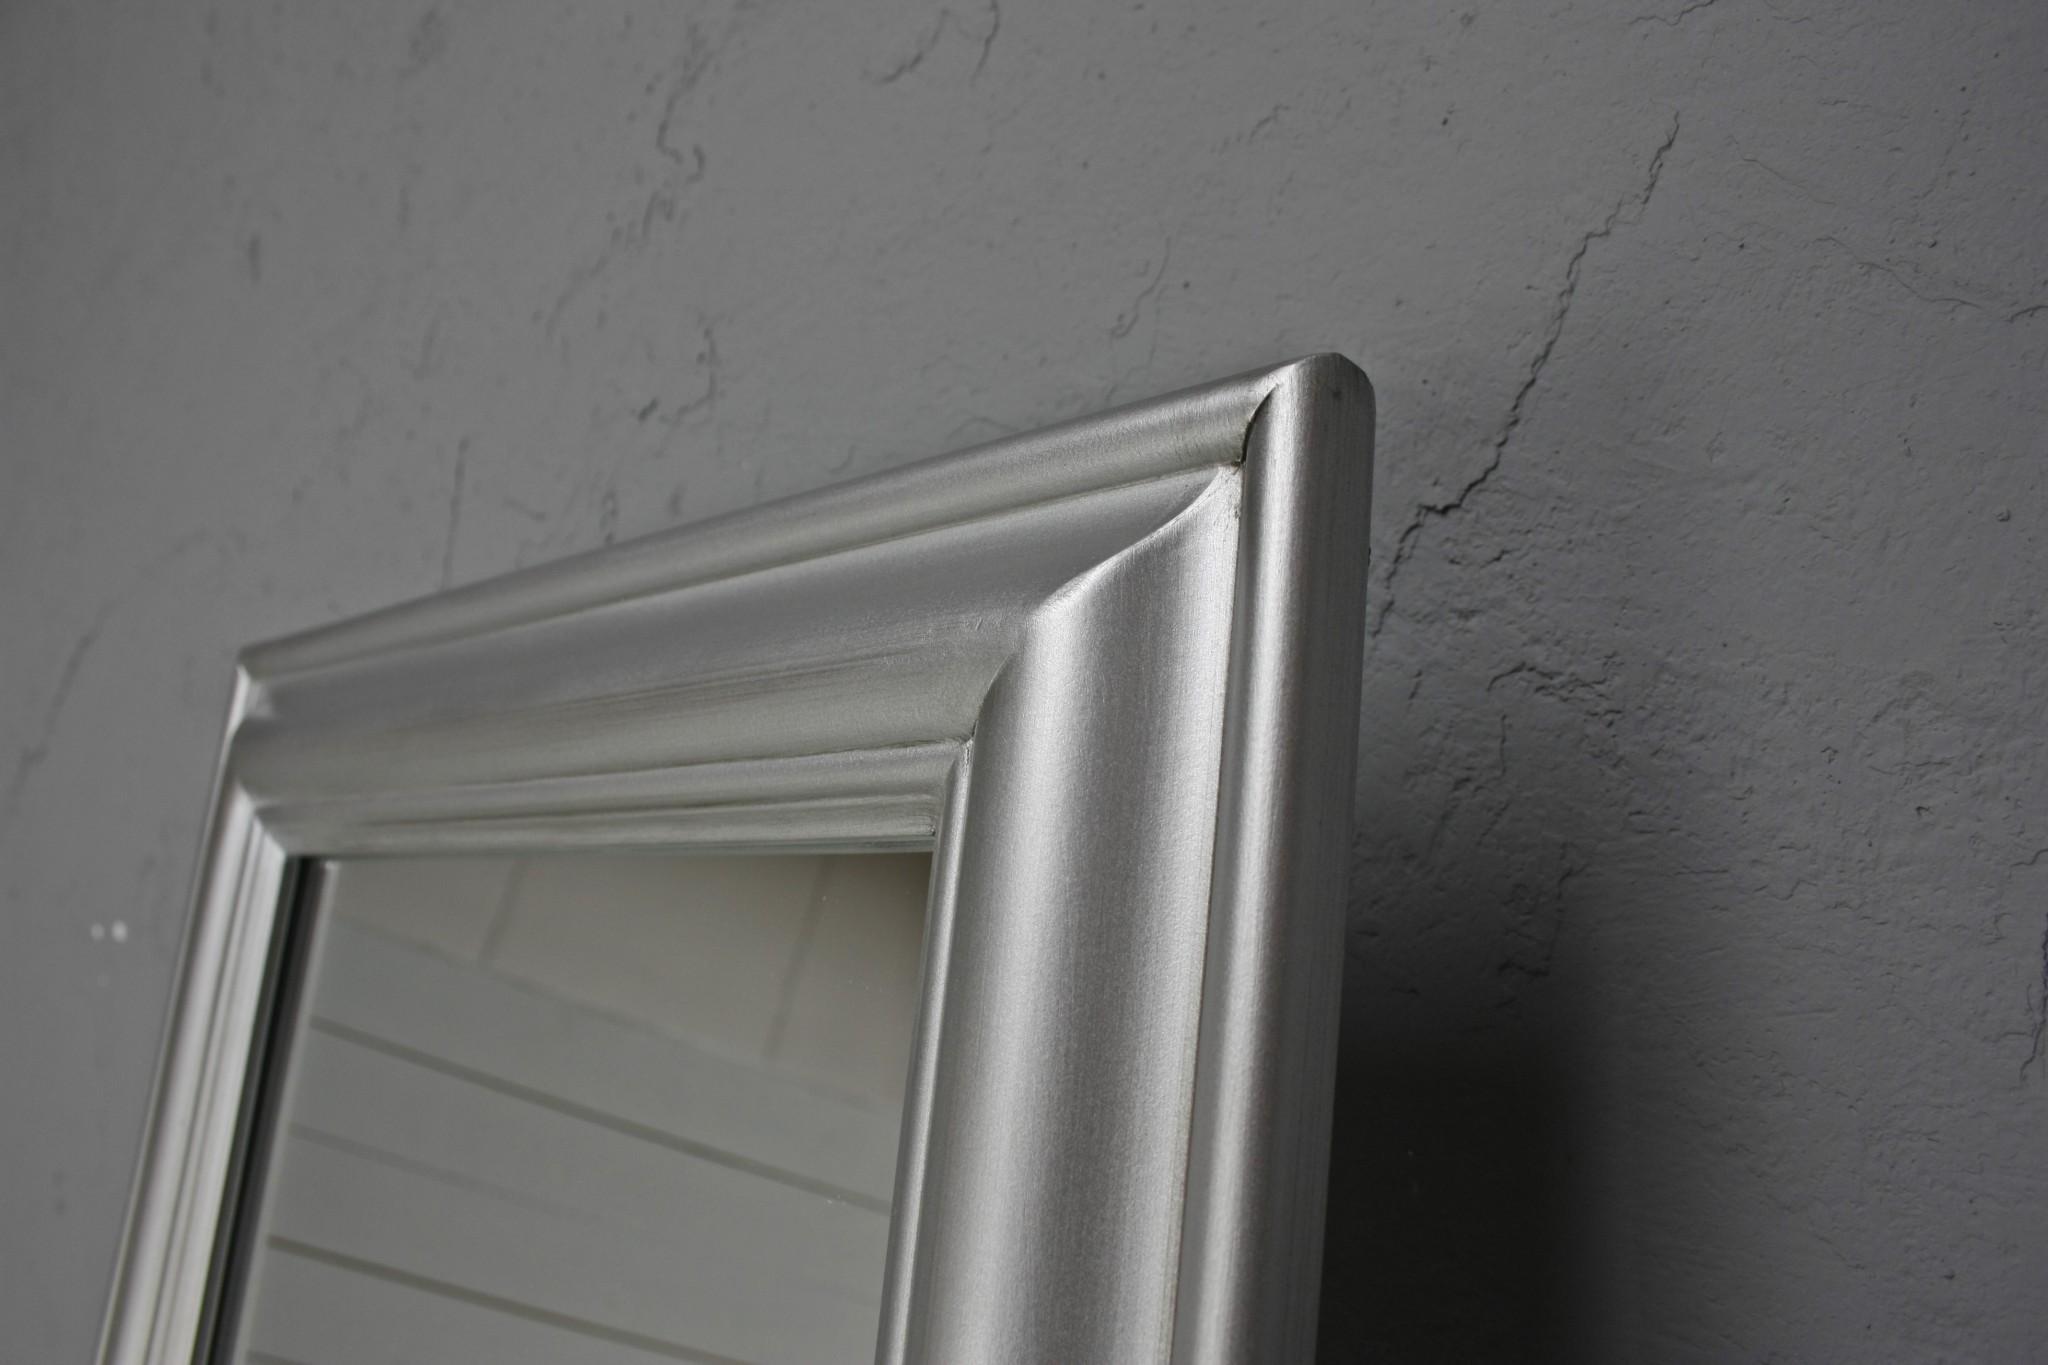 spiegel 180 wandspiegel standspiegel silber holz landhaus holzrahmen badspiegel. Black Bedroom Furniture Sets. Home Design Ideas